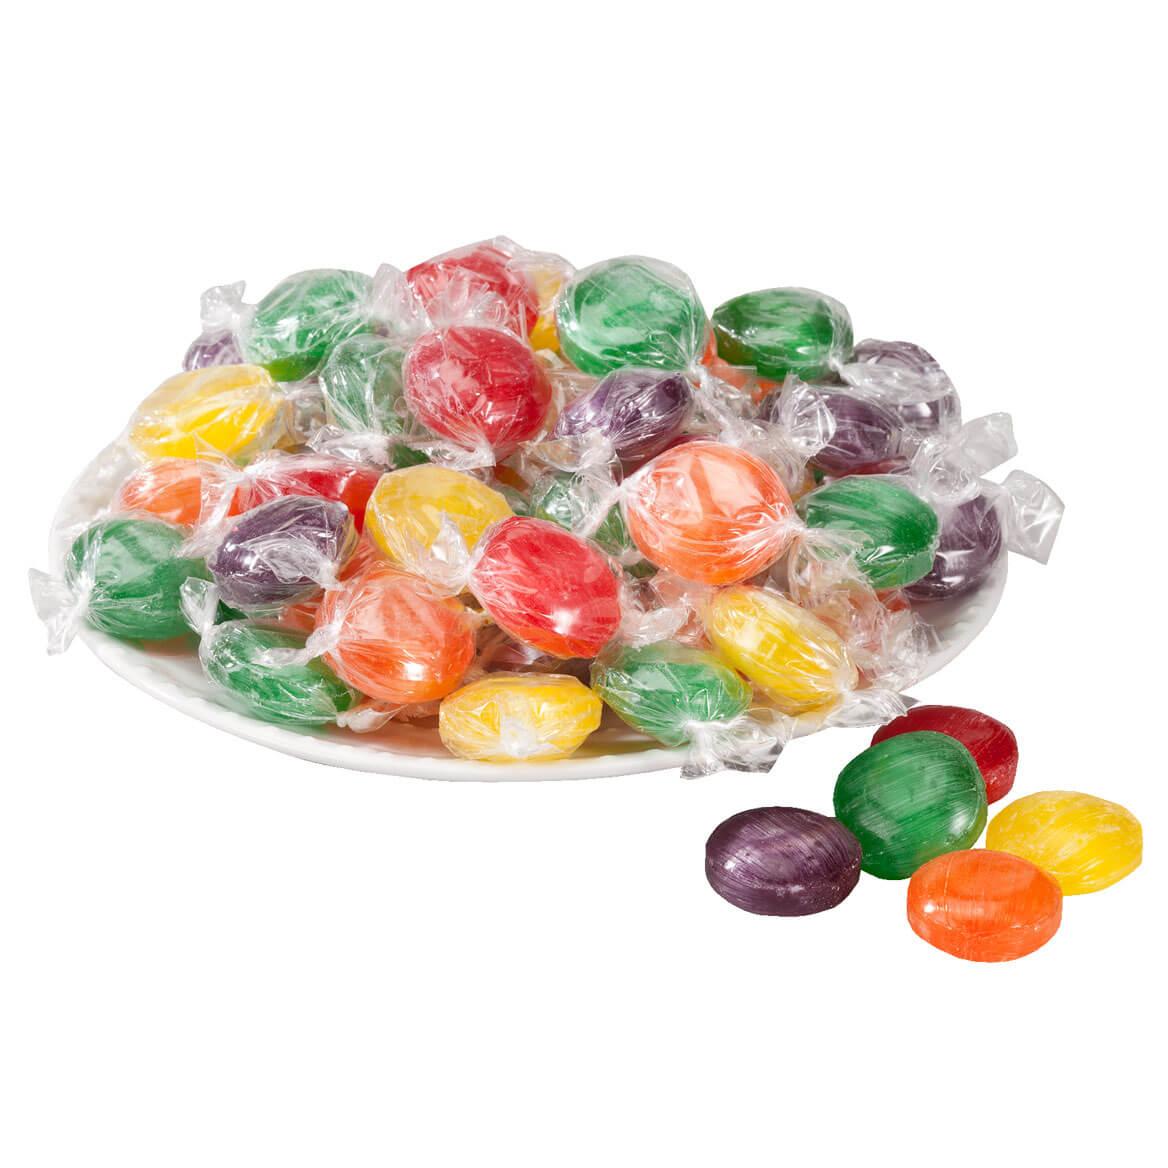 Assorted Fruit Button Hard Candies 19 oz.-356407